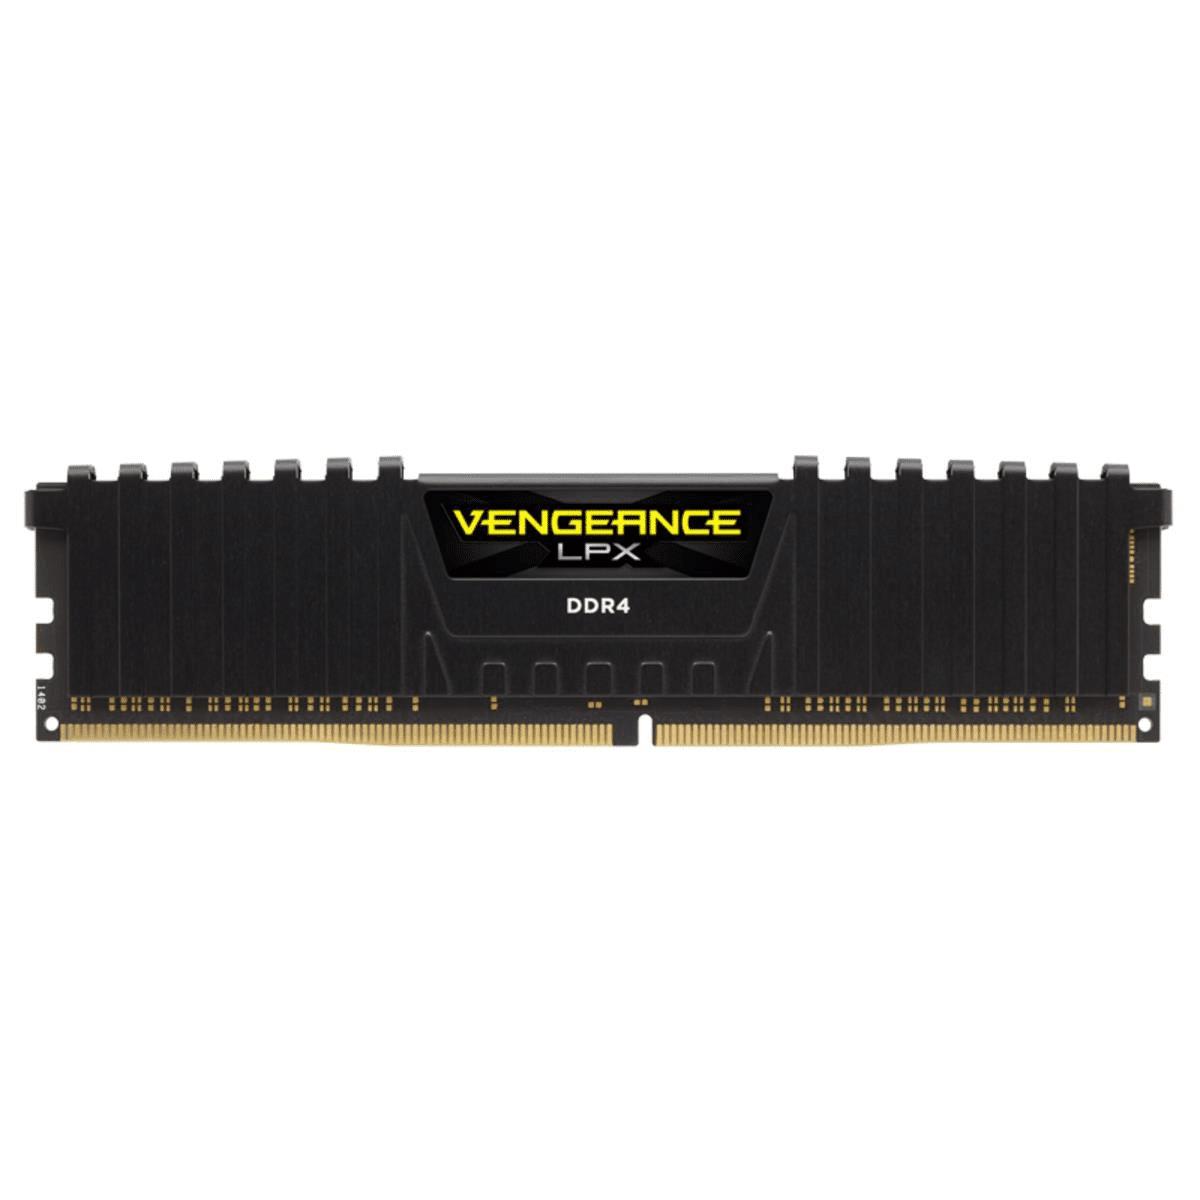 Corsair Vengeance LPX CMK32GX4M1D3000C16 Memory Module 32GB 1 x 32GB DDR4 3000MHz